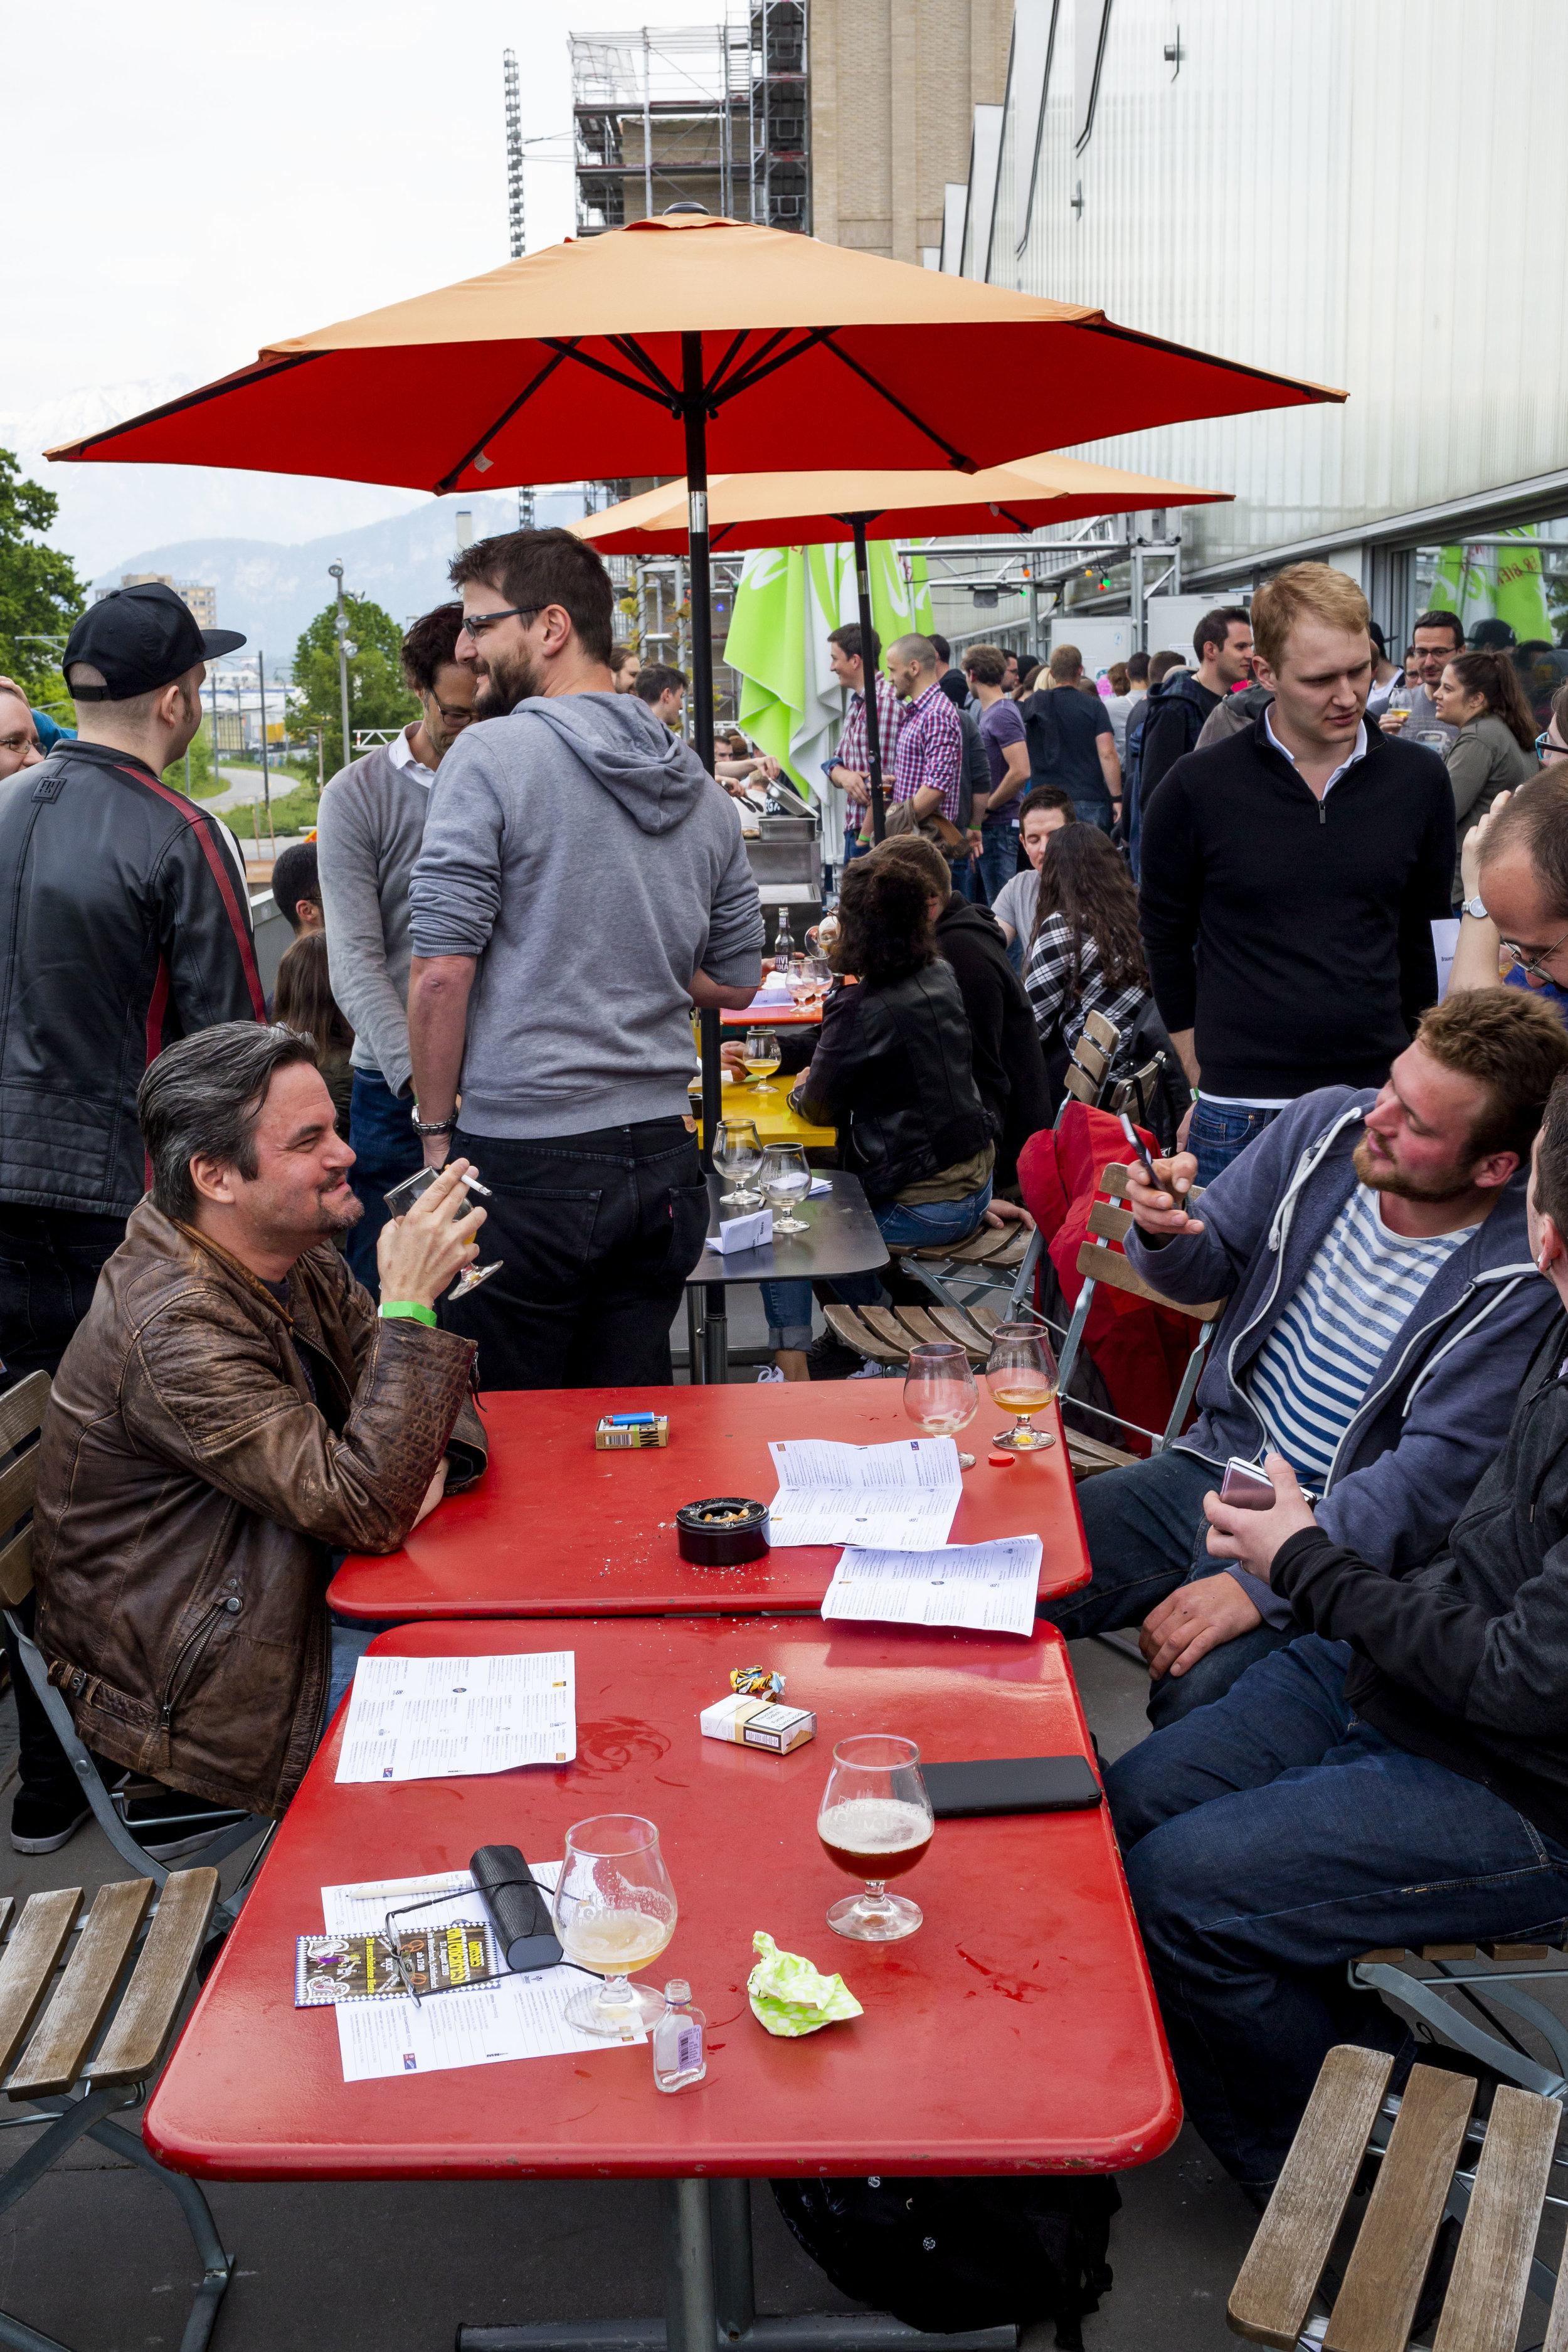 BierfestivalLuzern-50.jpg